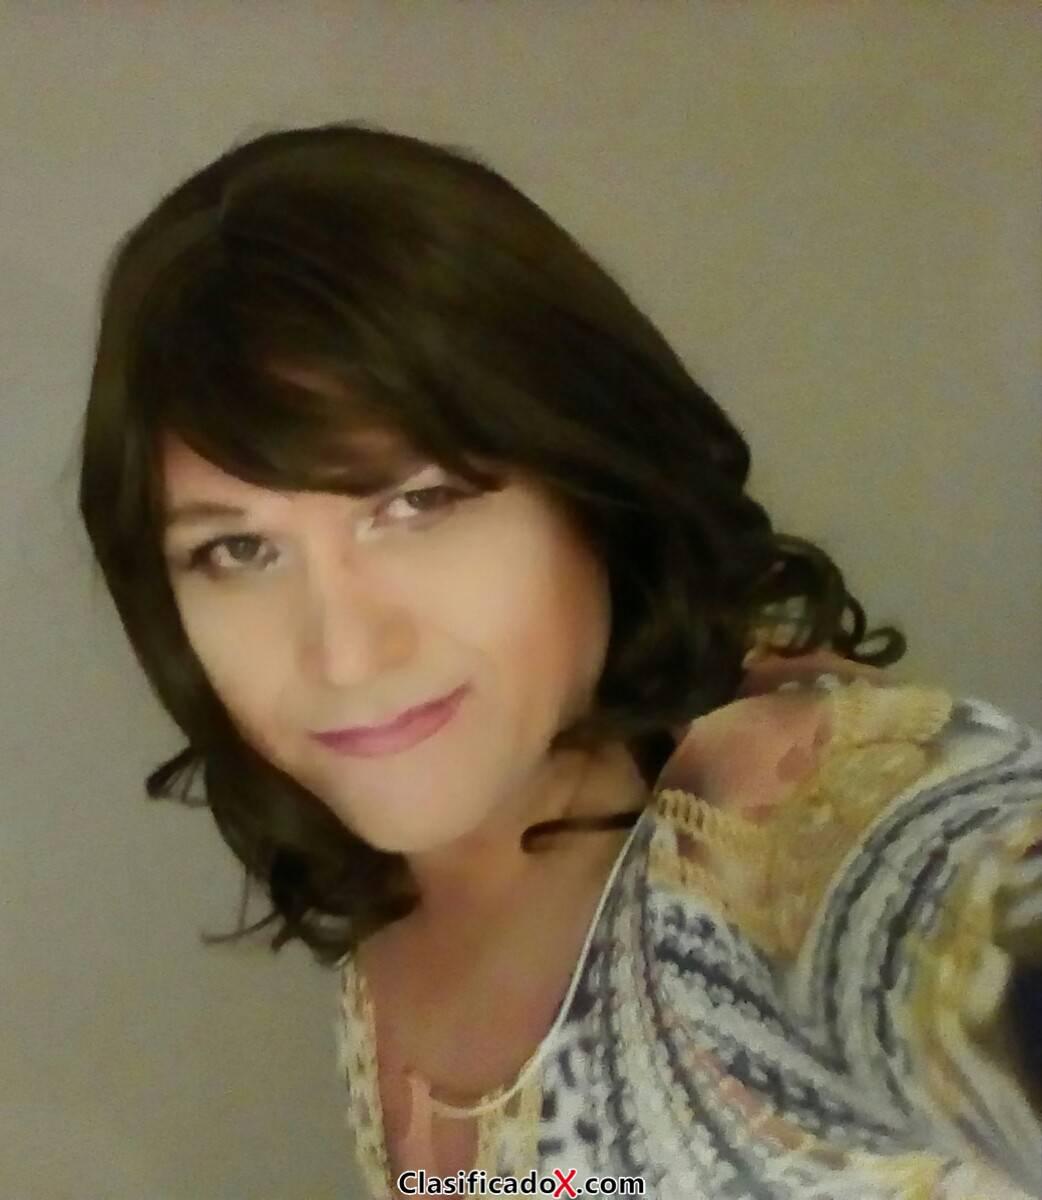 Transexual Shemale complaciente para atenderte como REY